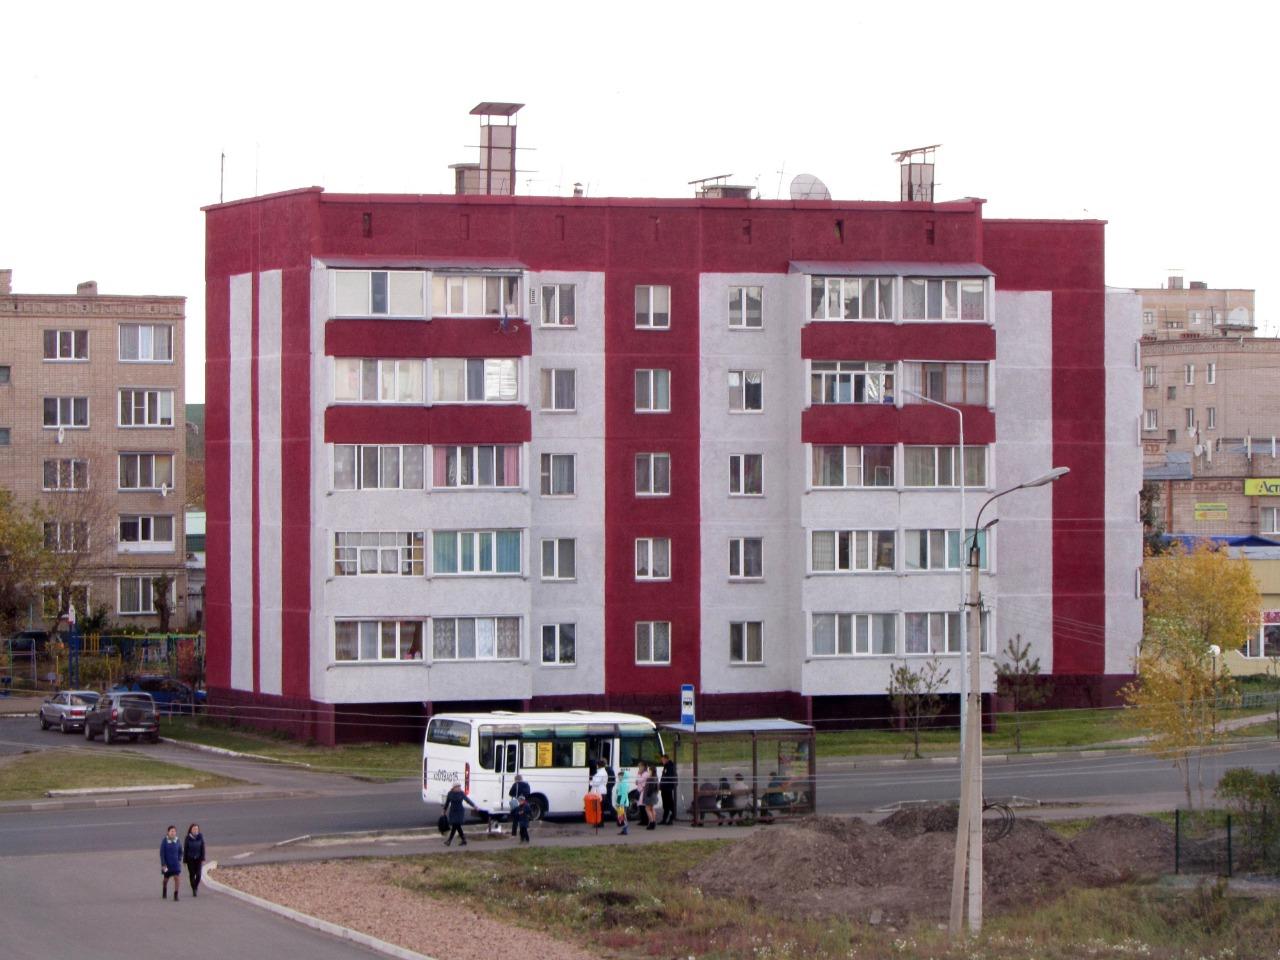 Тест: прогуляемся по улицам Петропавловска